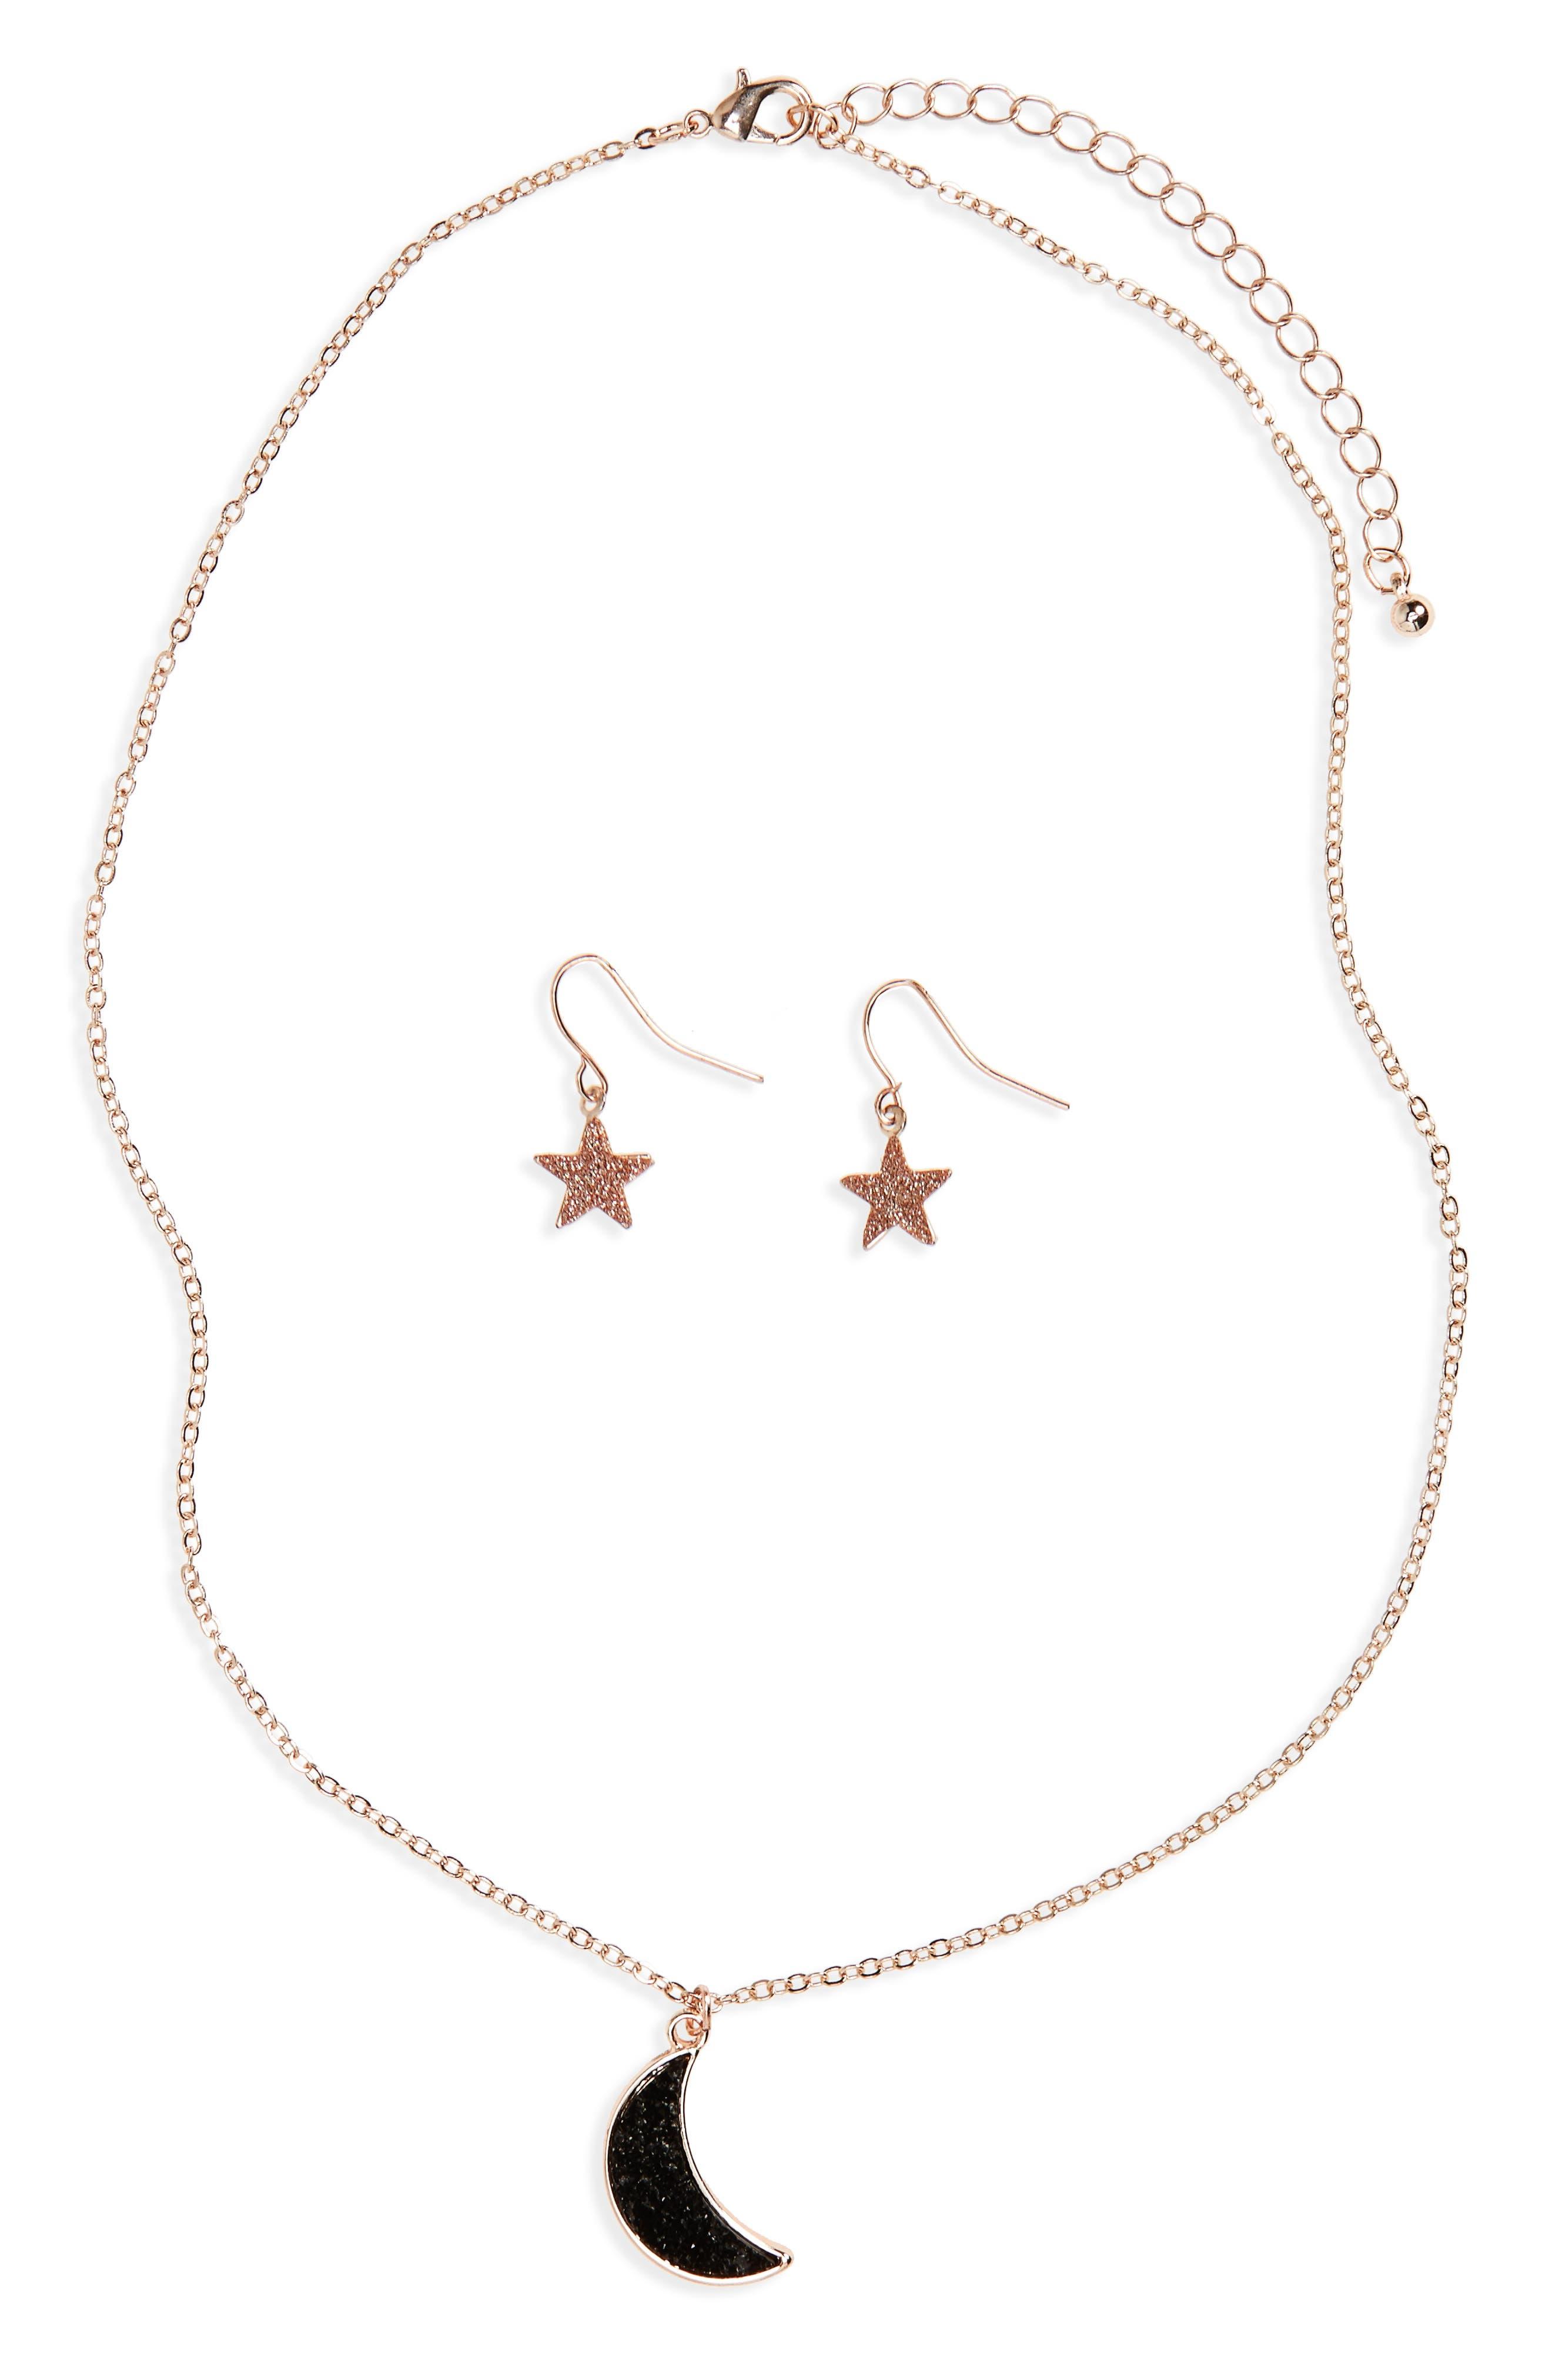 Wonderland Moon Necklace & Star Earrings Set,                         Main,                         color, Gold